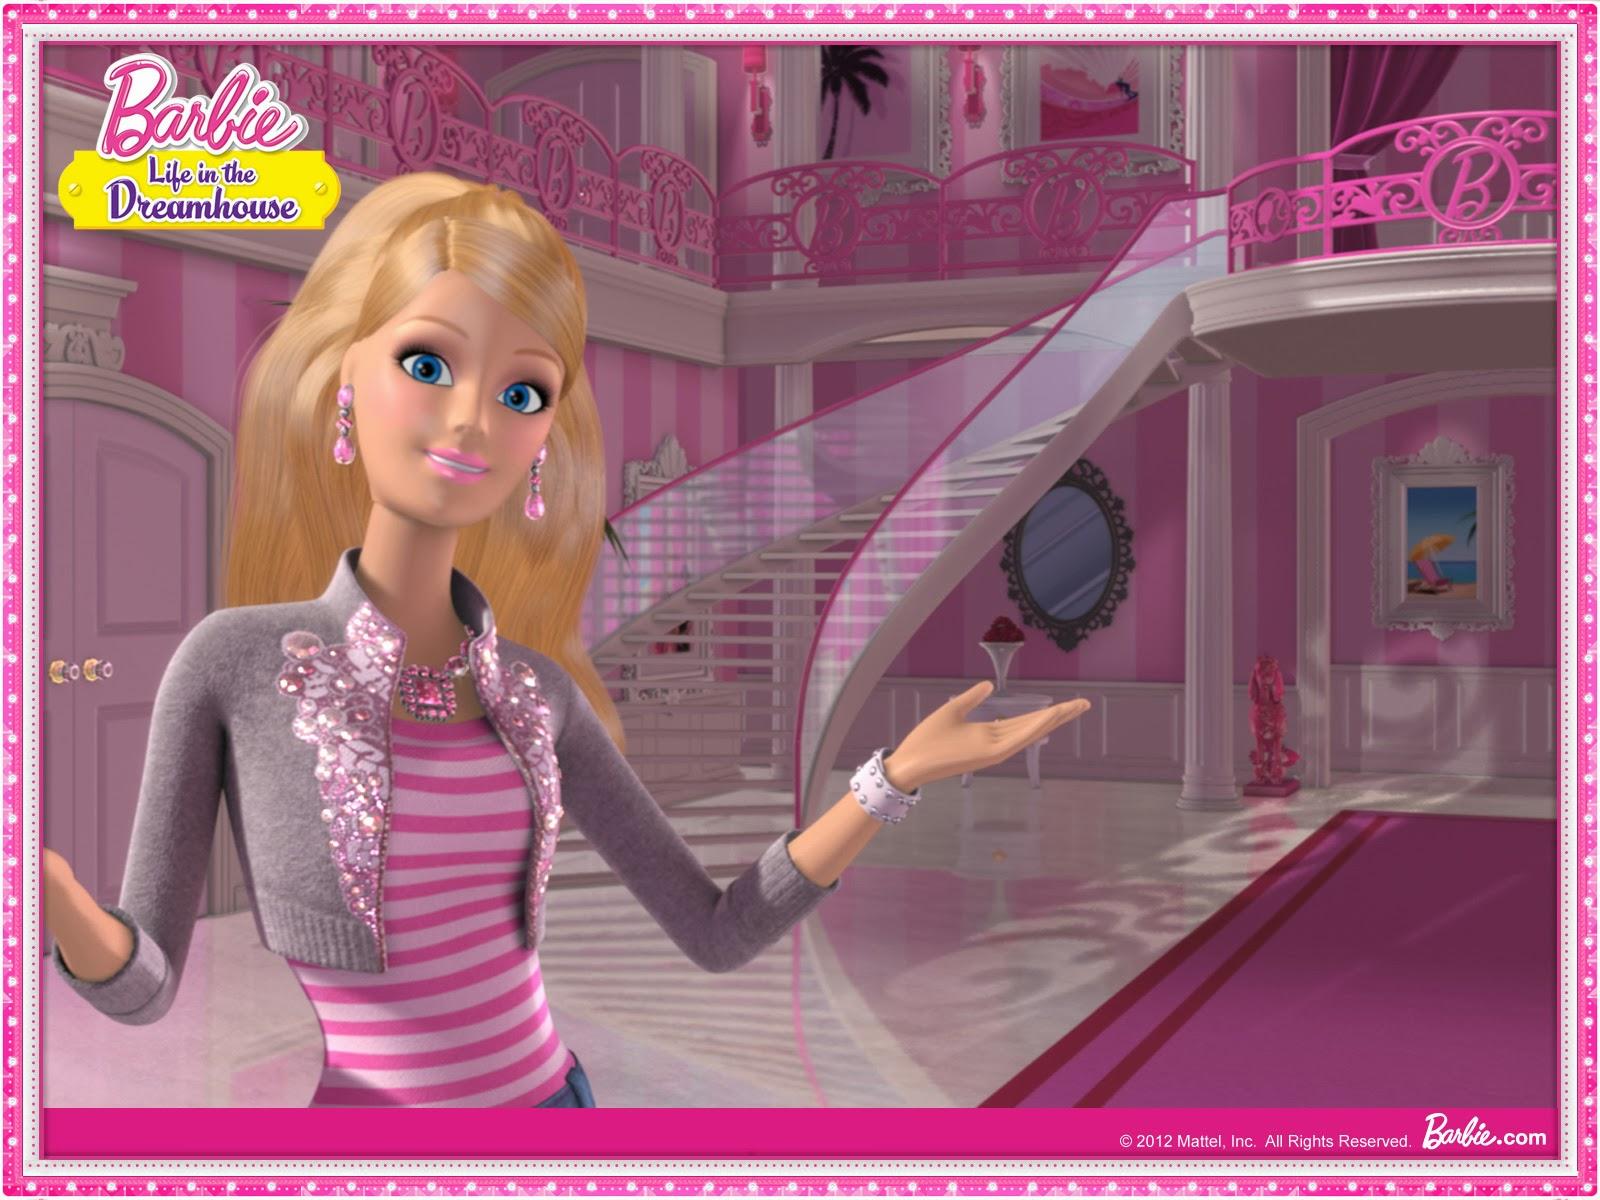 Kids Barbie Games Free Online Free Barbie Games Download